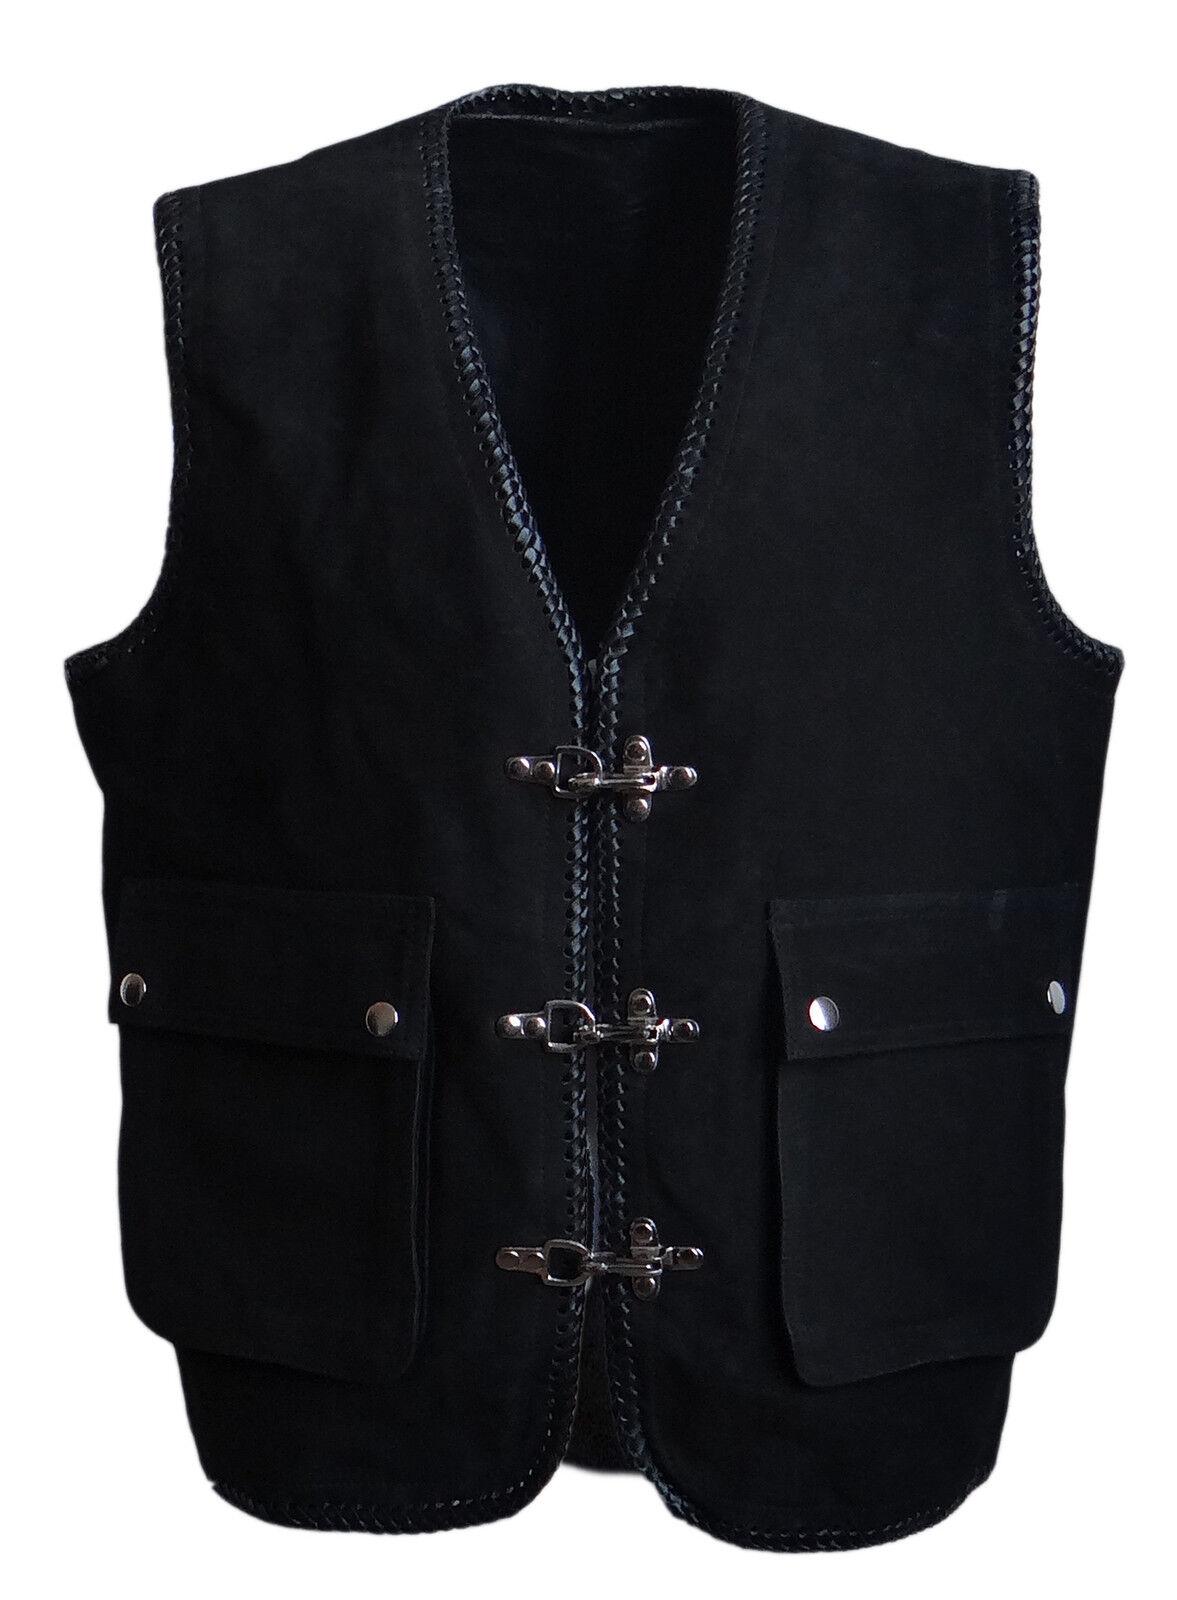 Bikerweste Kutte Lederweste Karabinerhaken Nubuk Nubuk Nubuk Leder schwarz Größe S | Elegante und robuste Verpackung  f70391